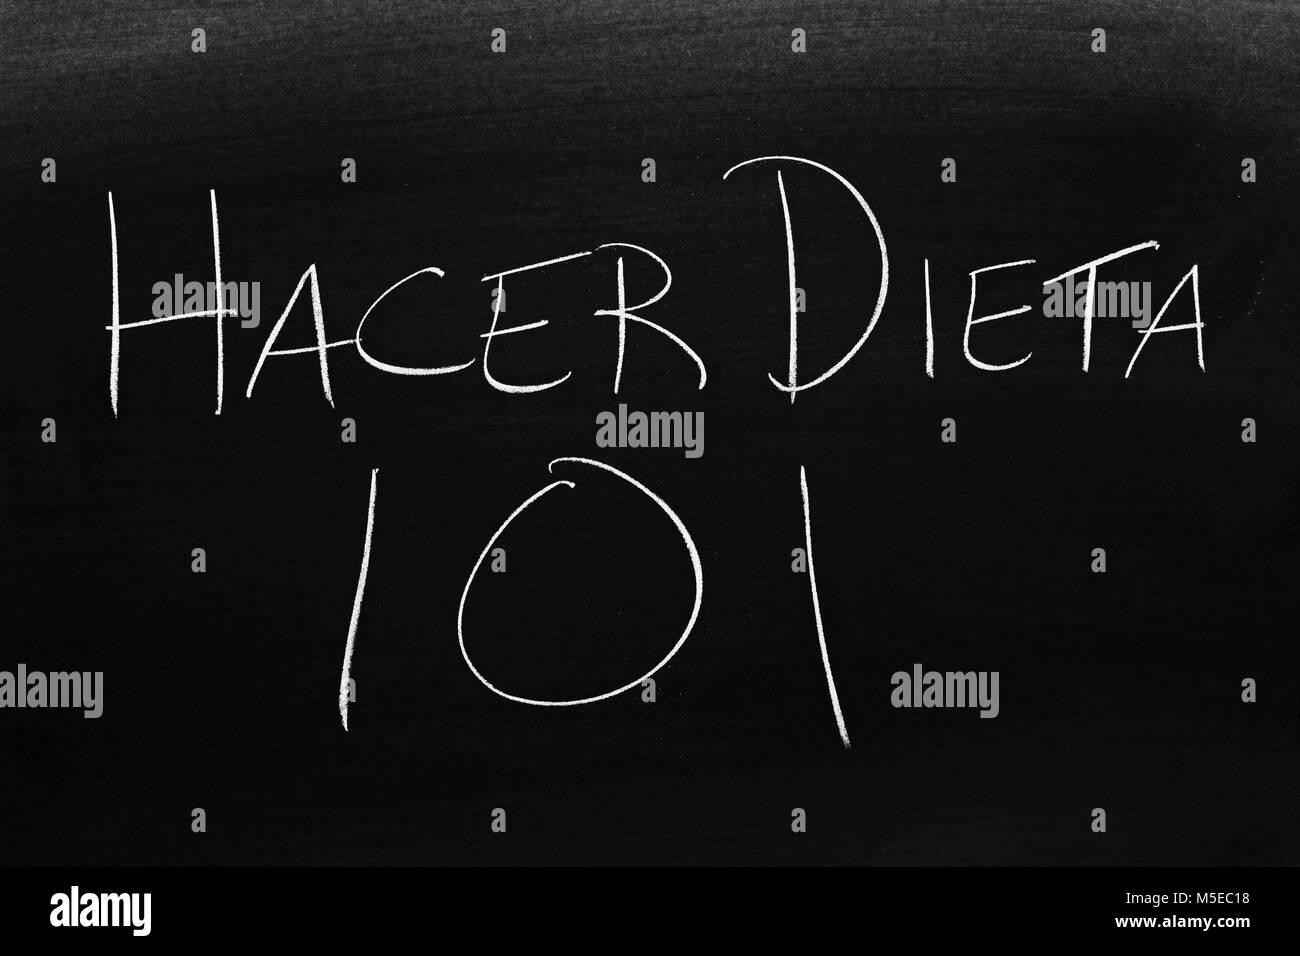 The words Hacer Dieta 101 on a blackboard in chalk - Stock Image